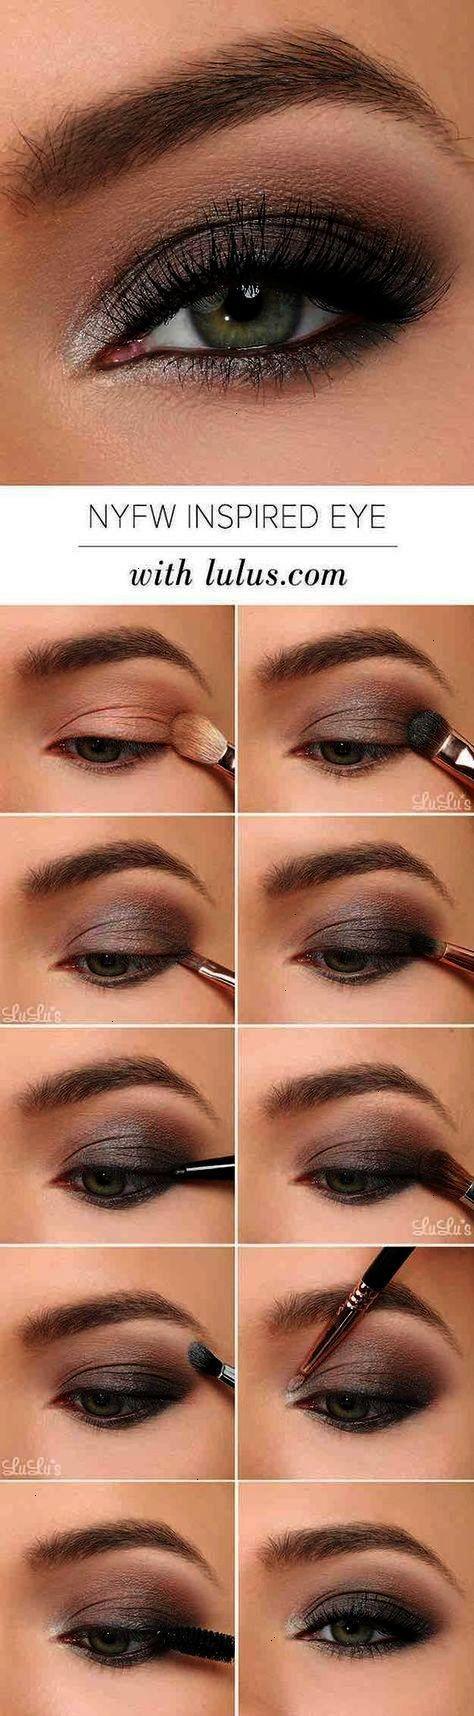 Makeup for black dress green eyes   makeup tutorials for green eyes  amazing green eye makeup